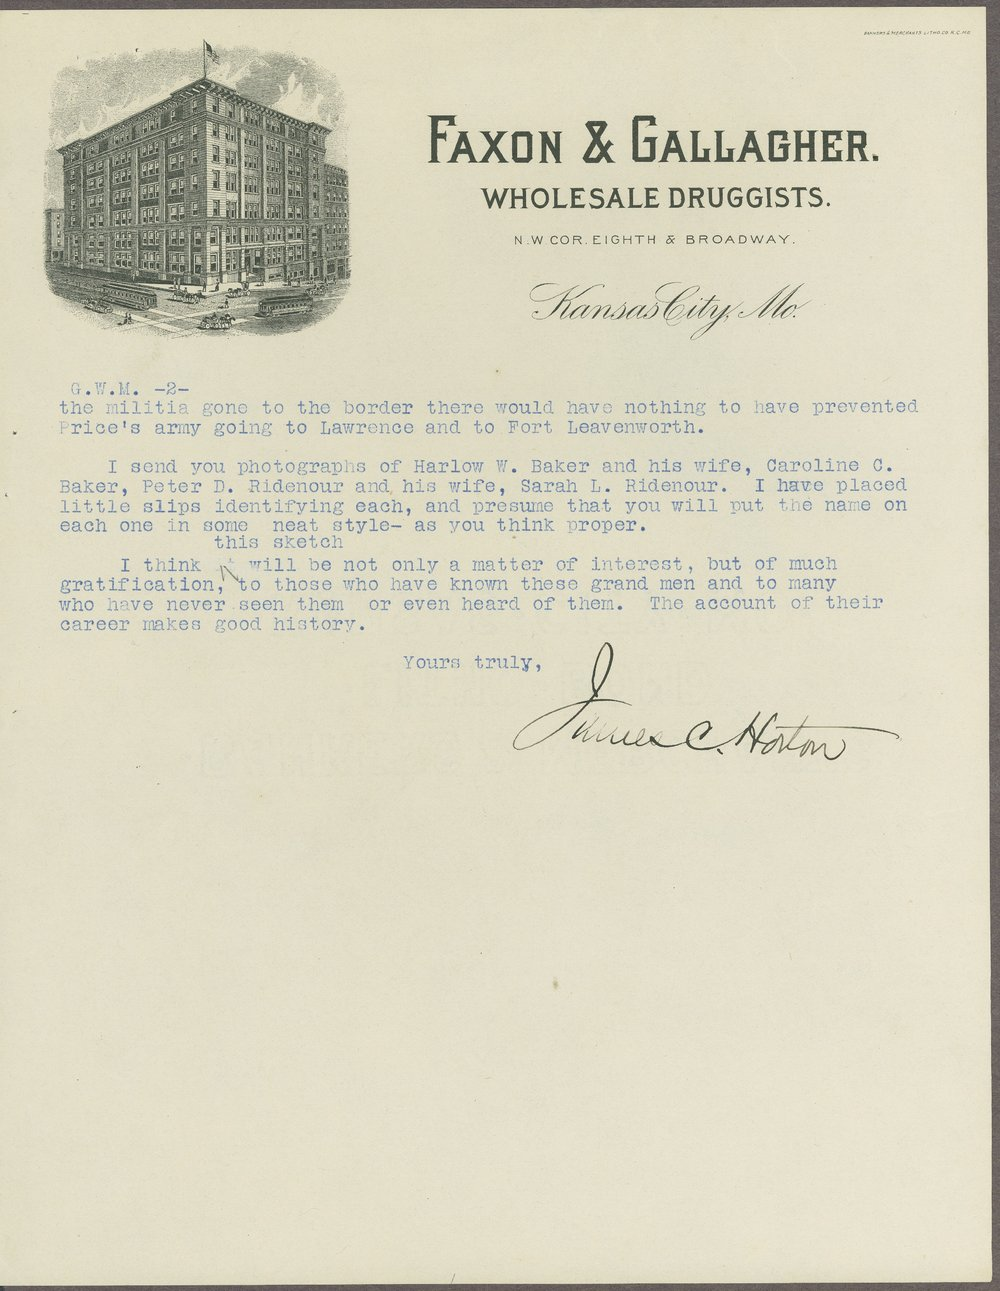 James C. Horton correspondence - 7